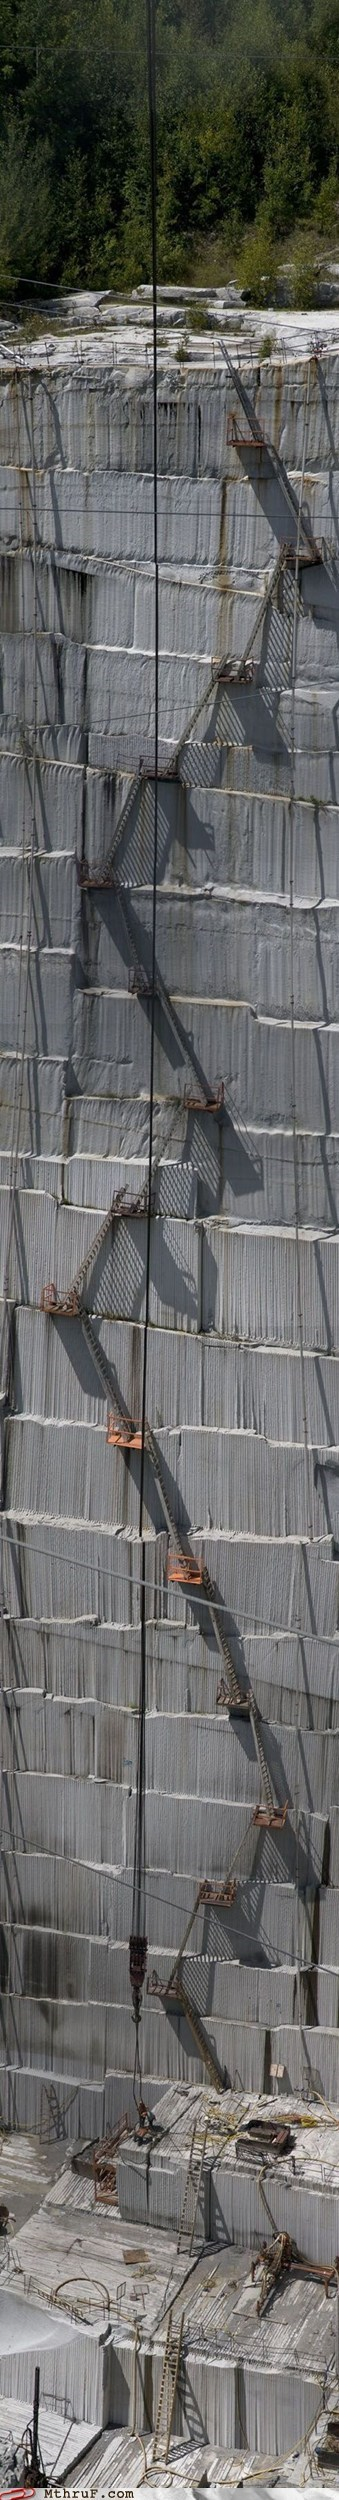 commuting ladders - 5496631040